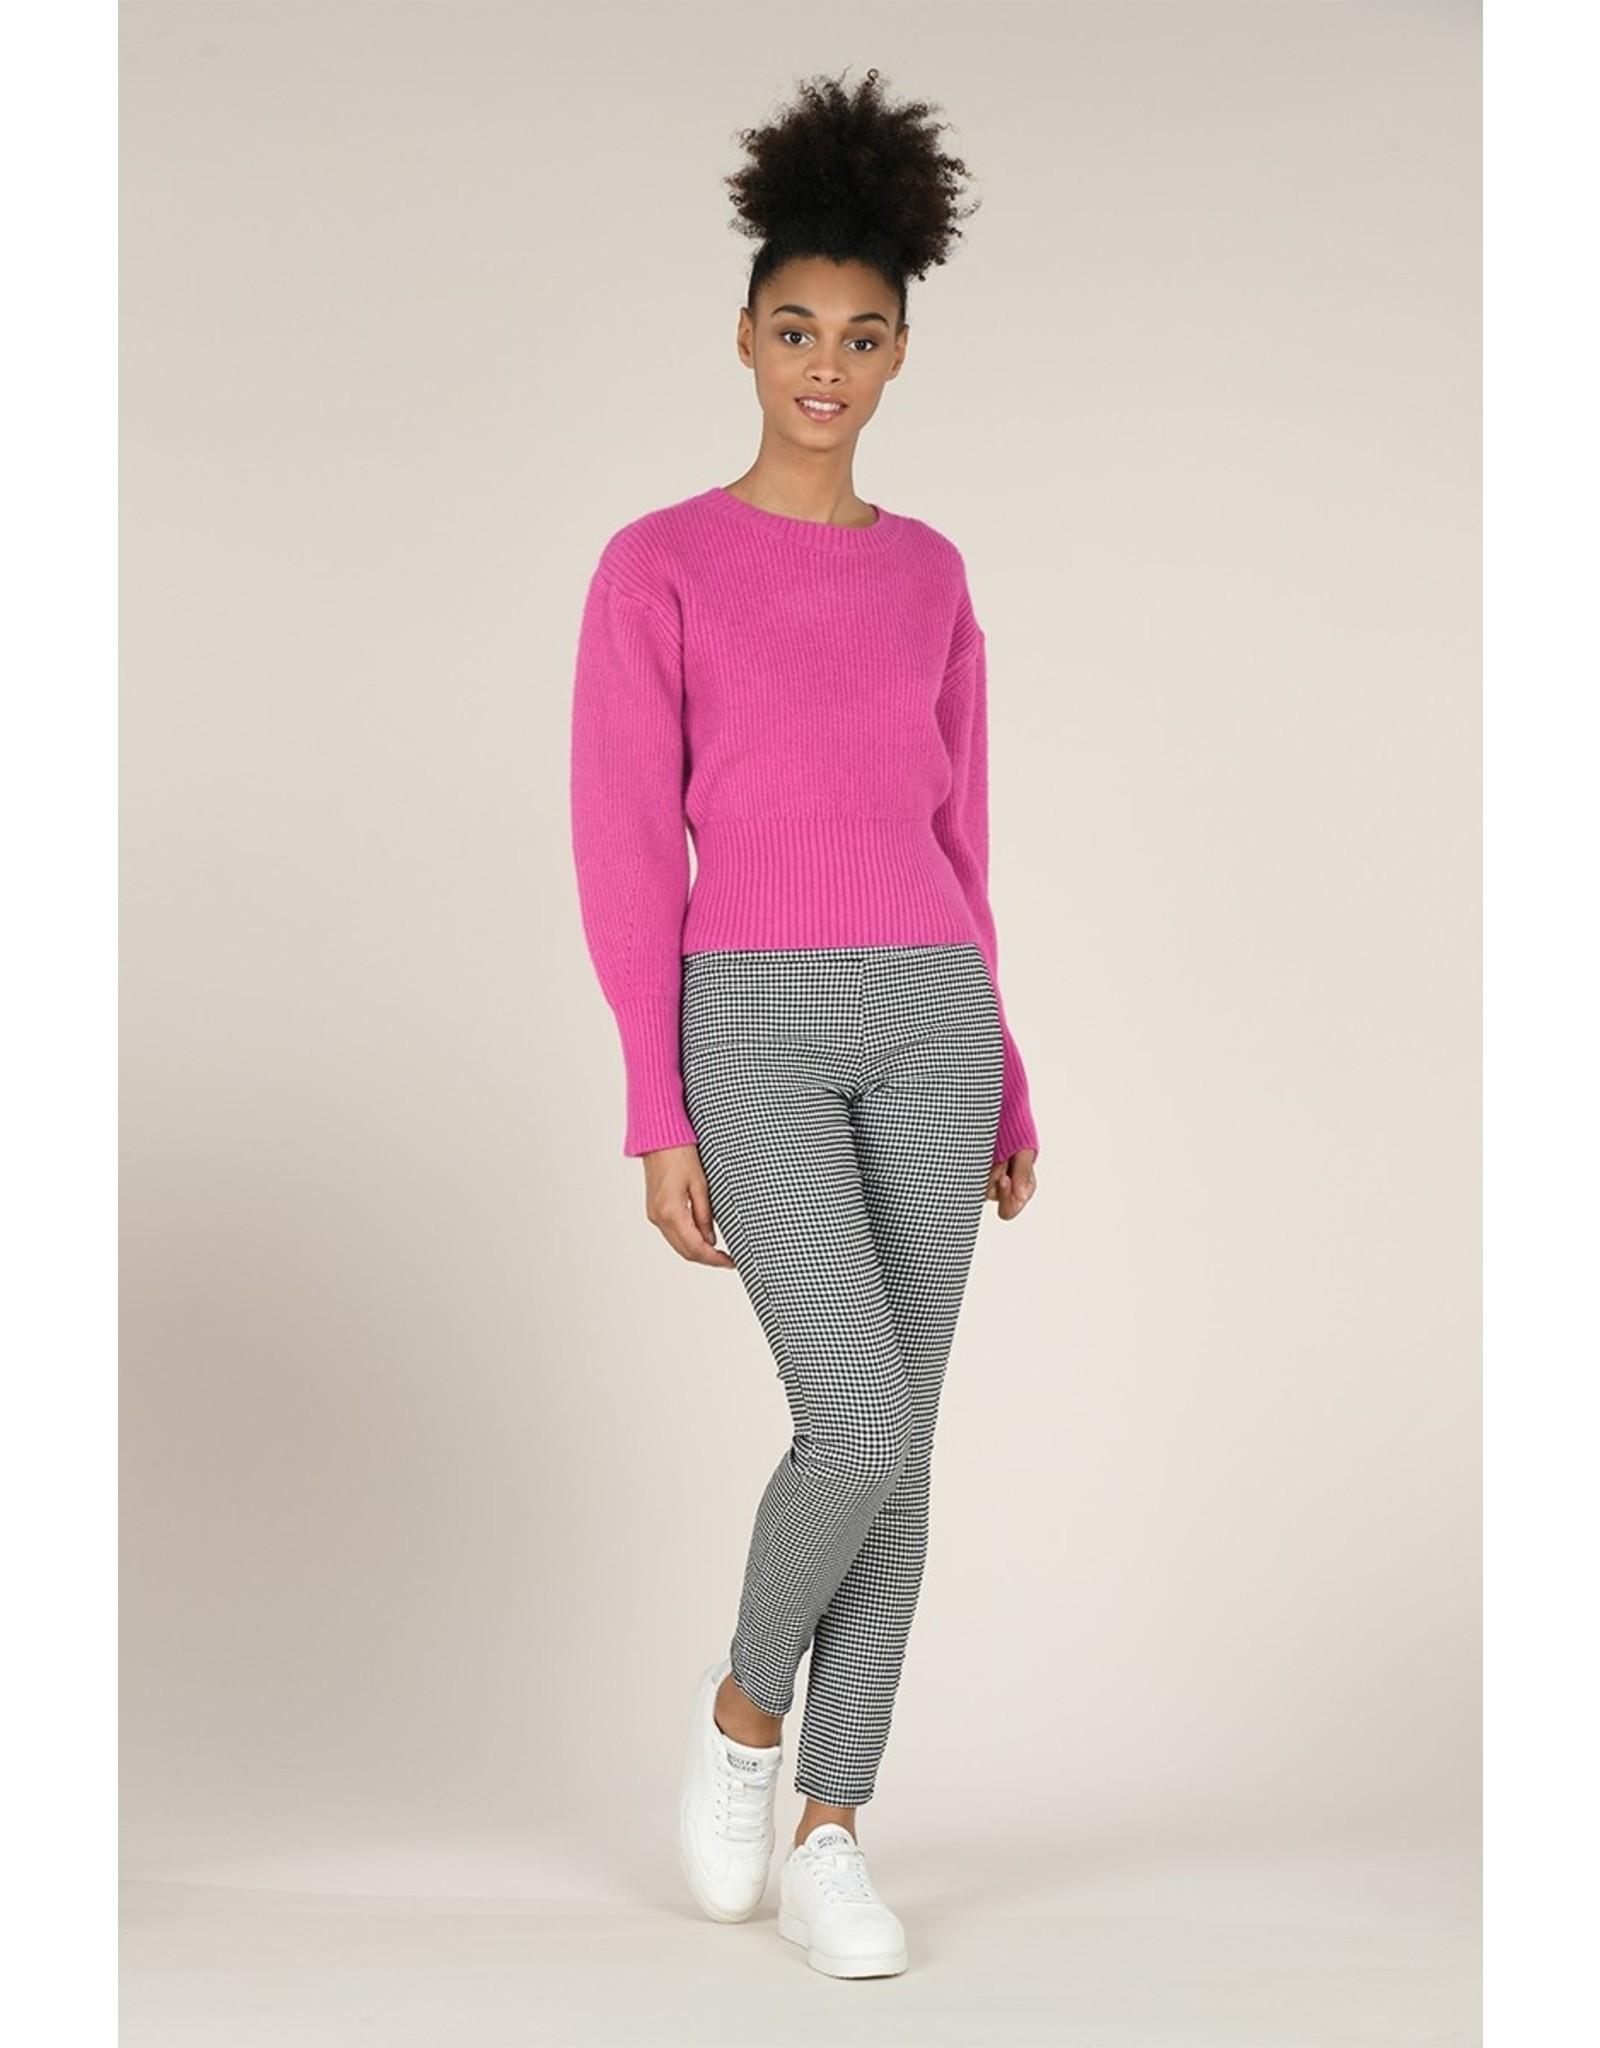 Molly Bracken Molly Bracken - Bubblegum pink cropped sweater